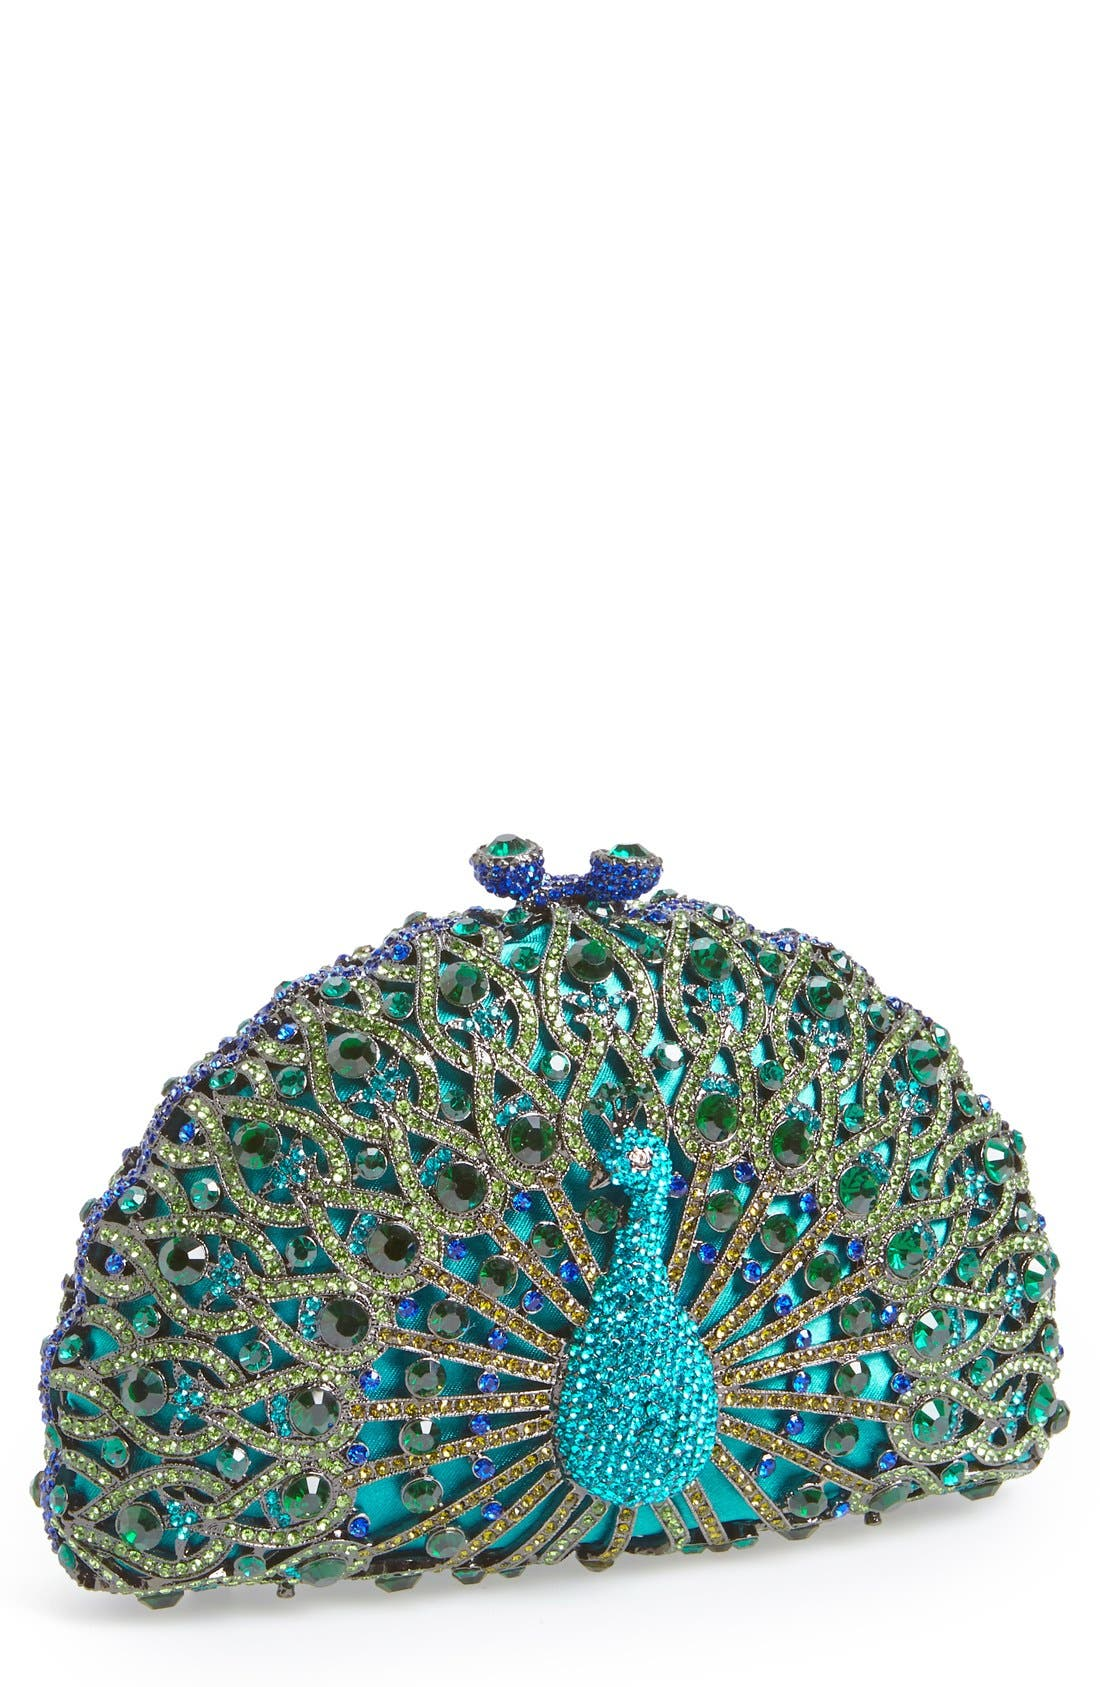 Alternate Image 1 Selected - Natasha Couture 'Peacock' Clutch